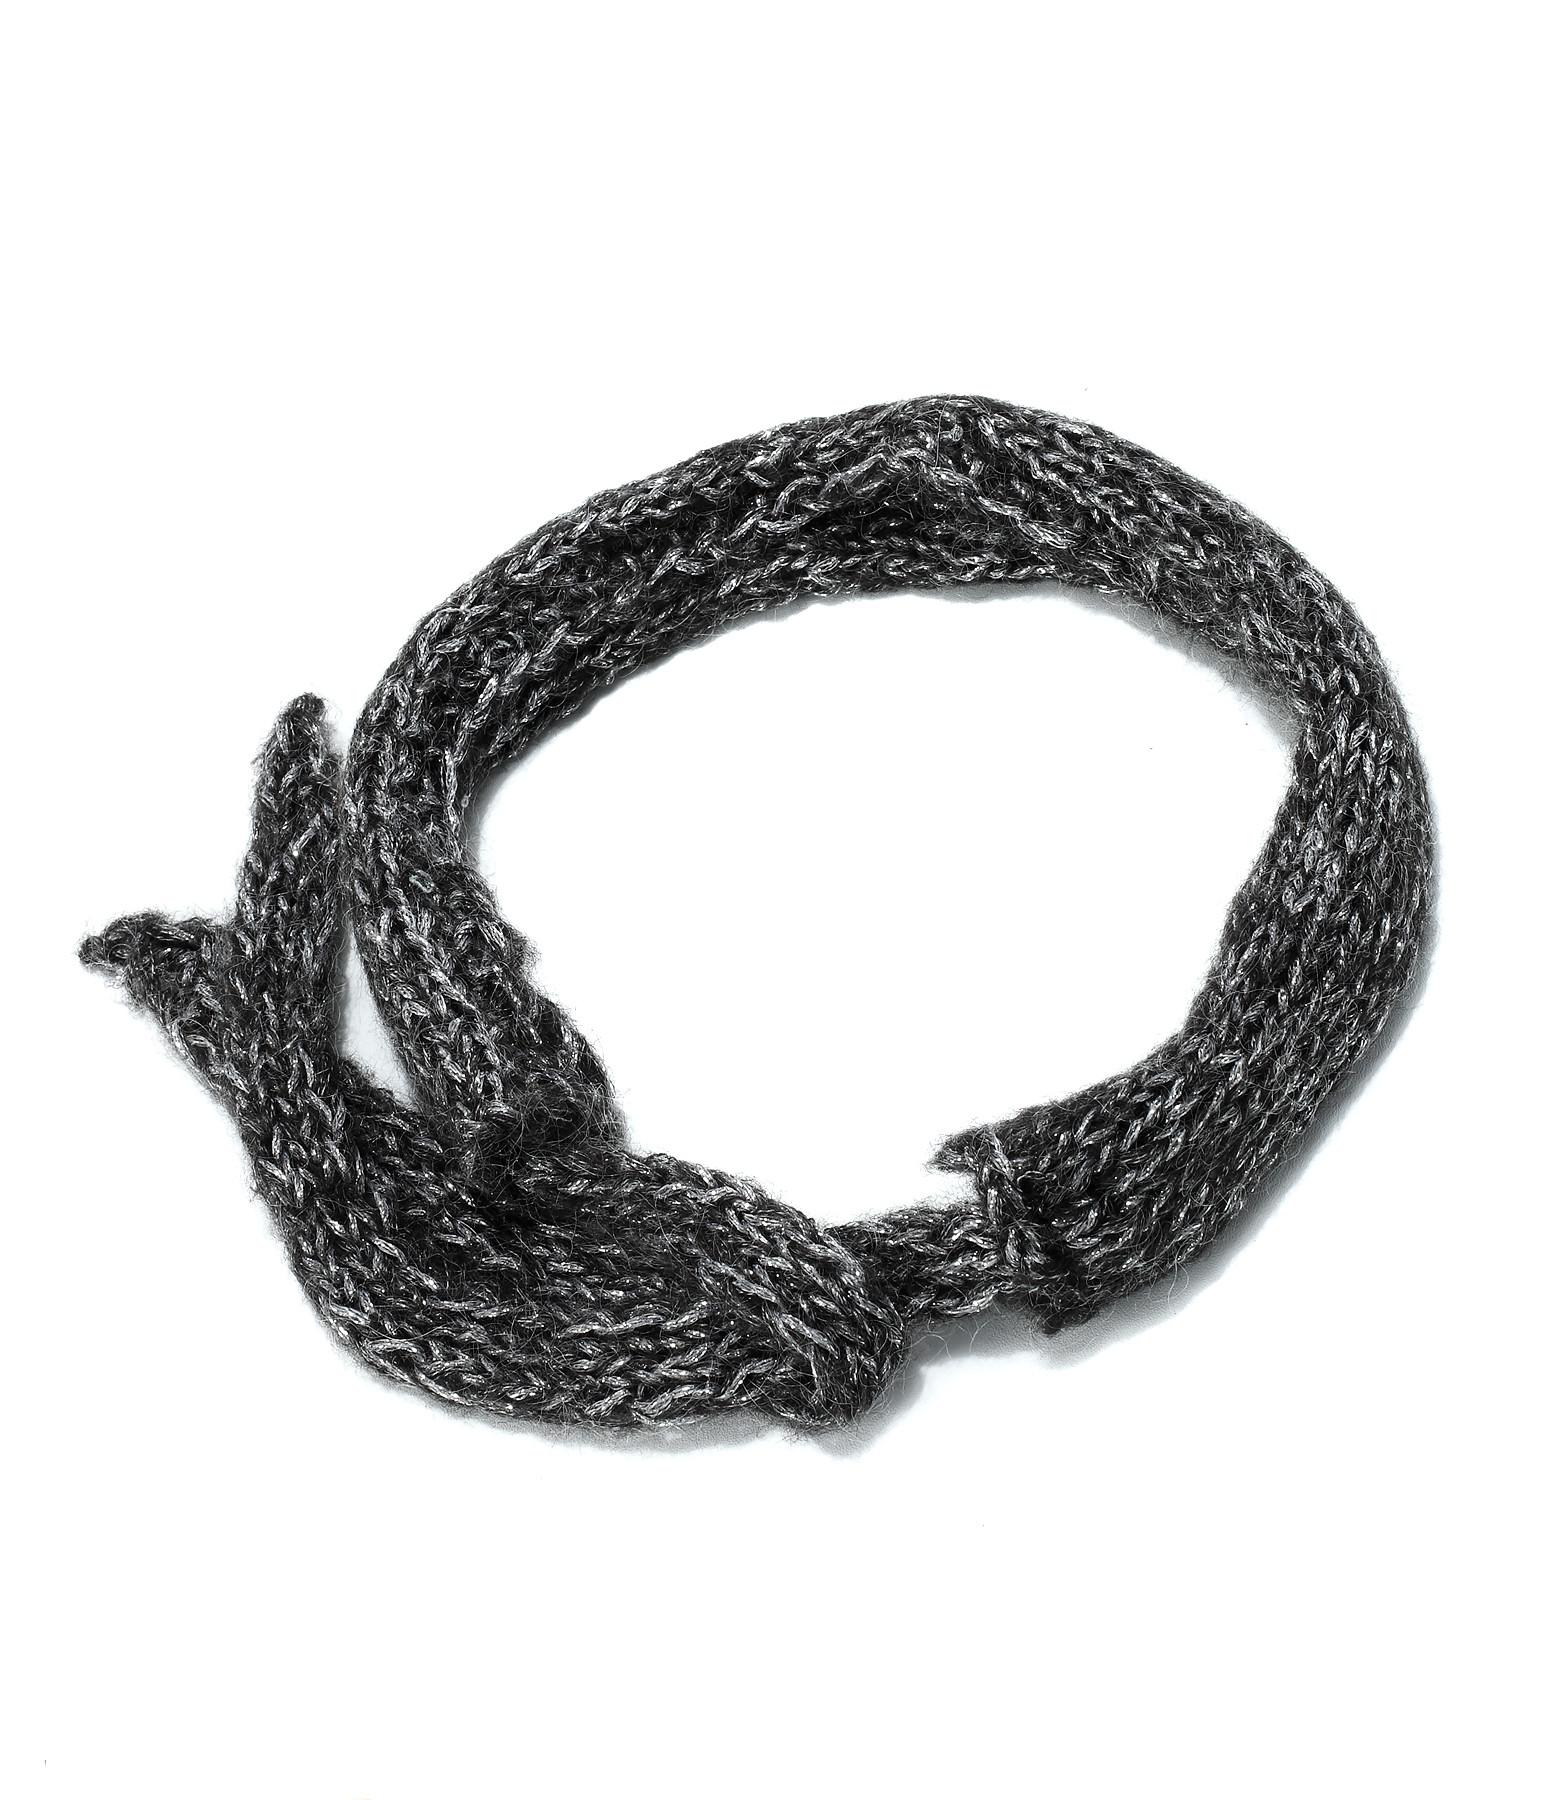 IDA DEGLIAME - Headband Mon Petit Lurex Laine Noir Silver